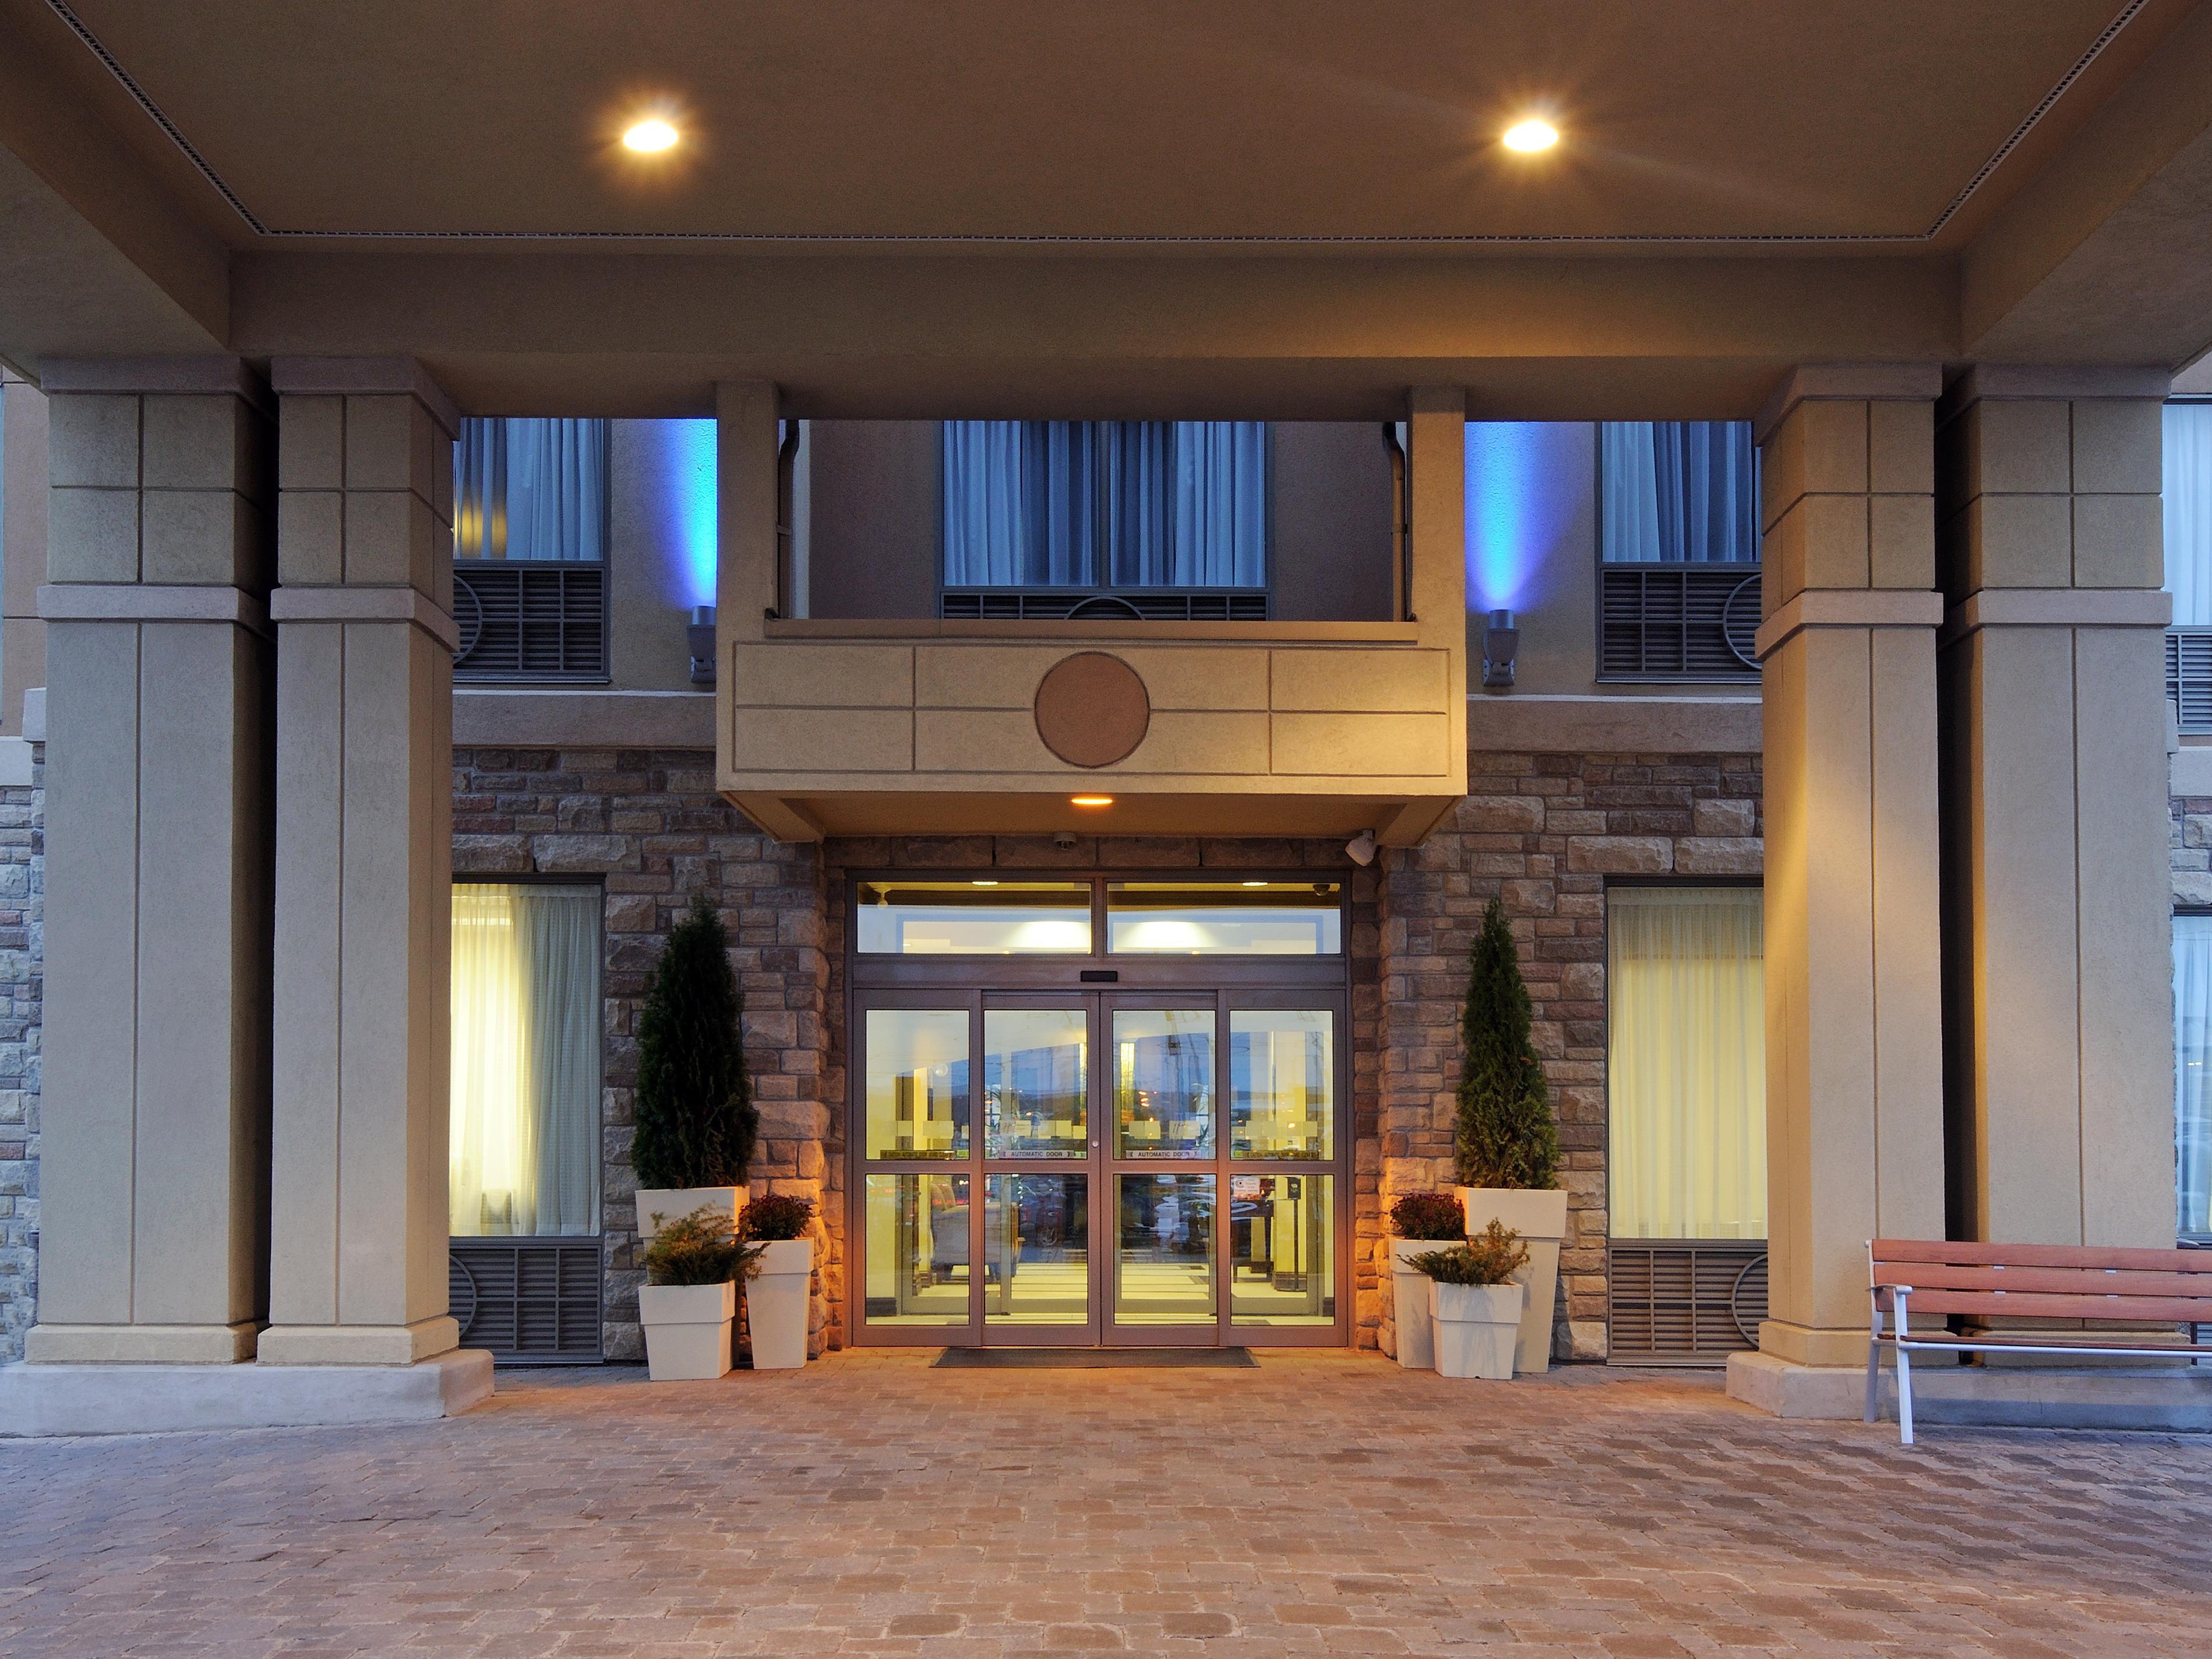 North Bay Casino